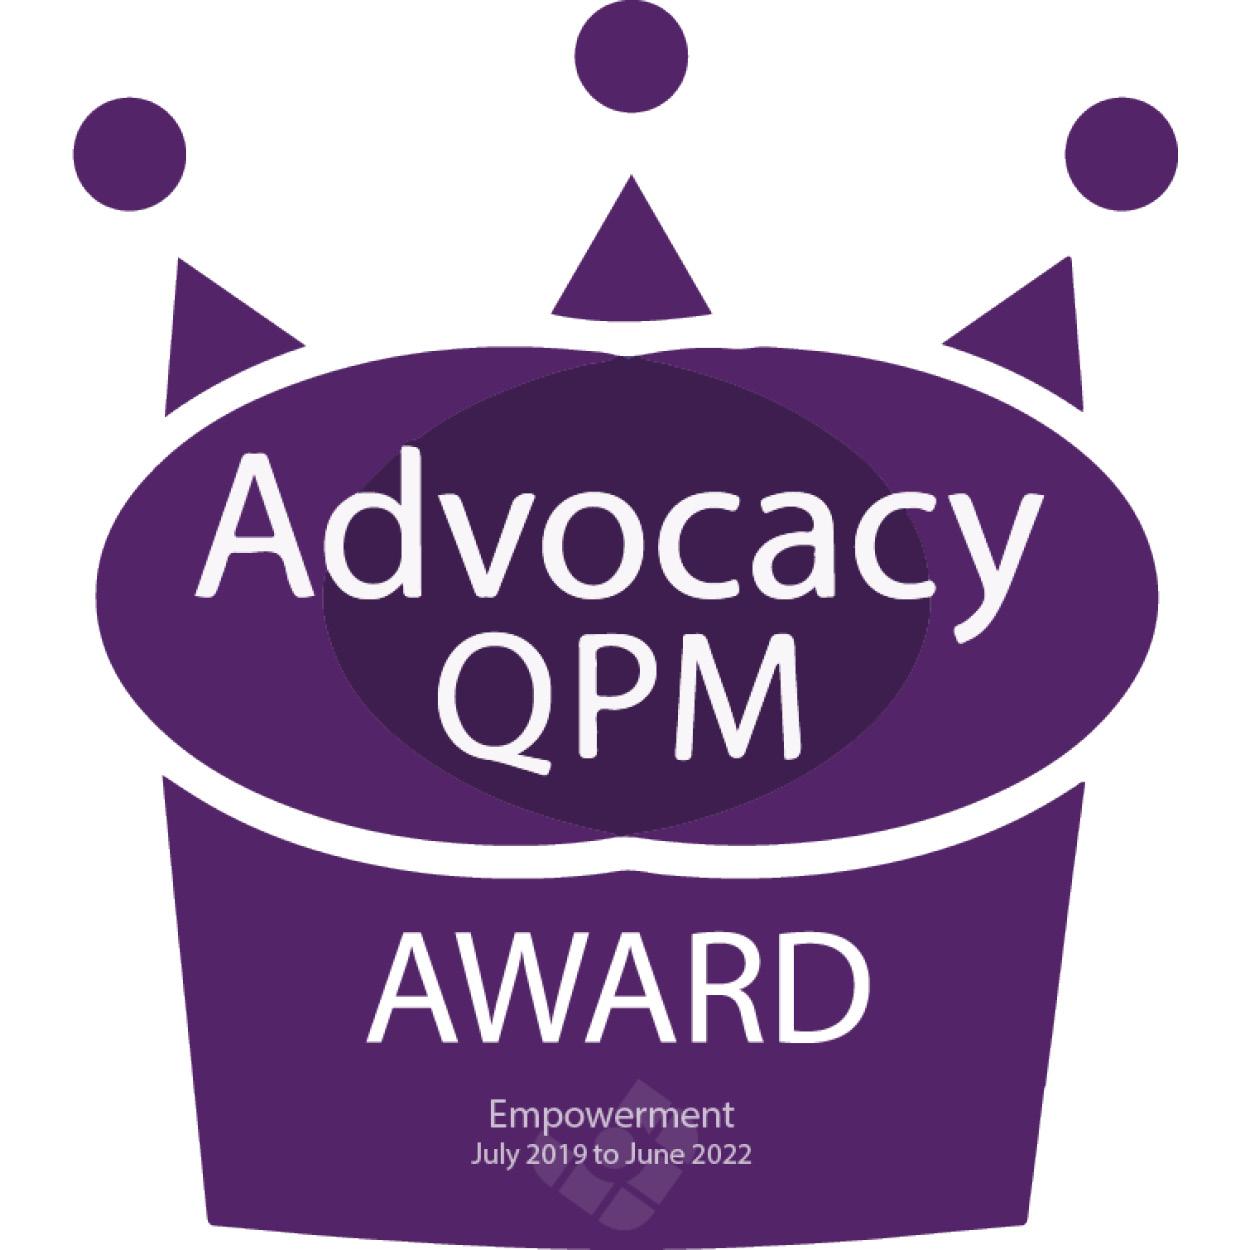 QPM AWARD Empowerment Colour 300px x 300px